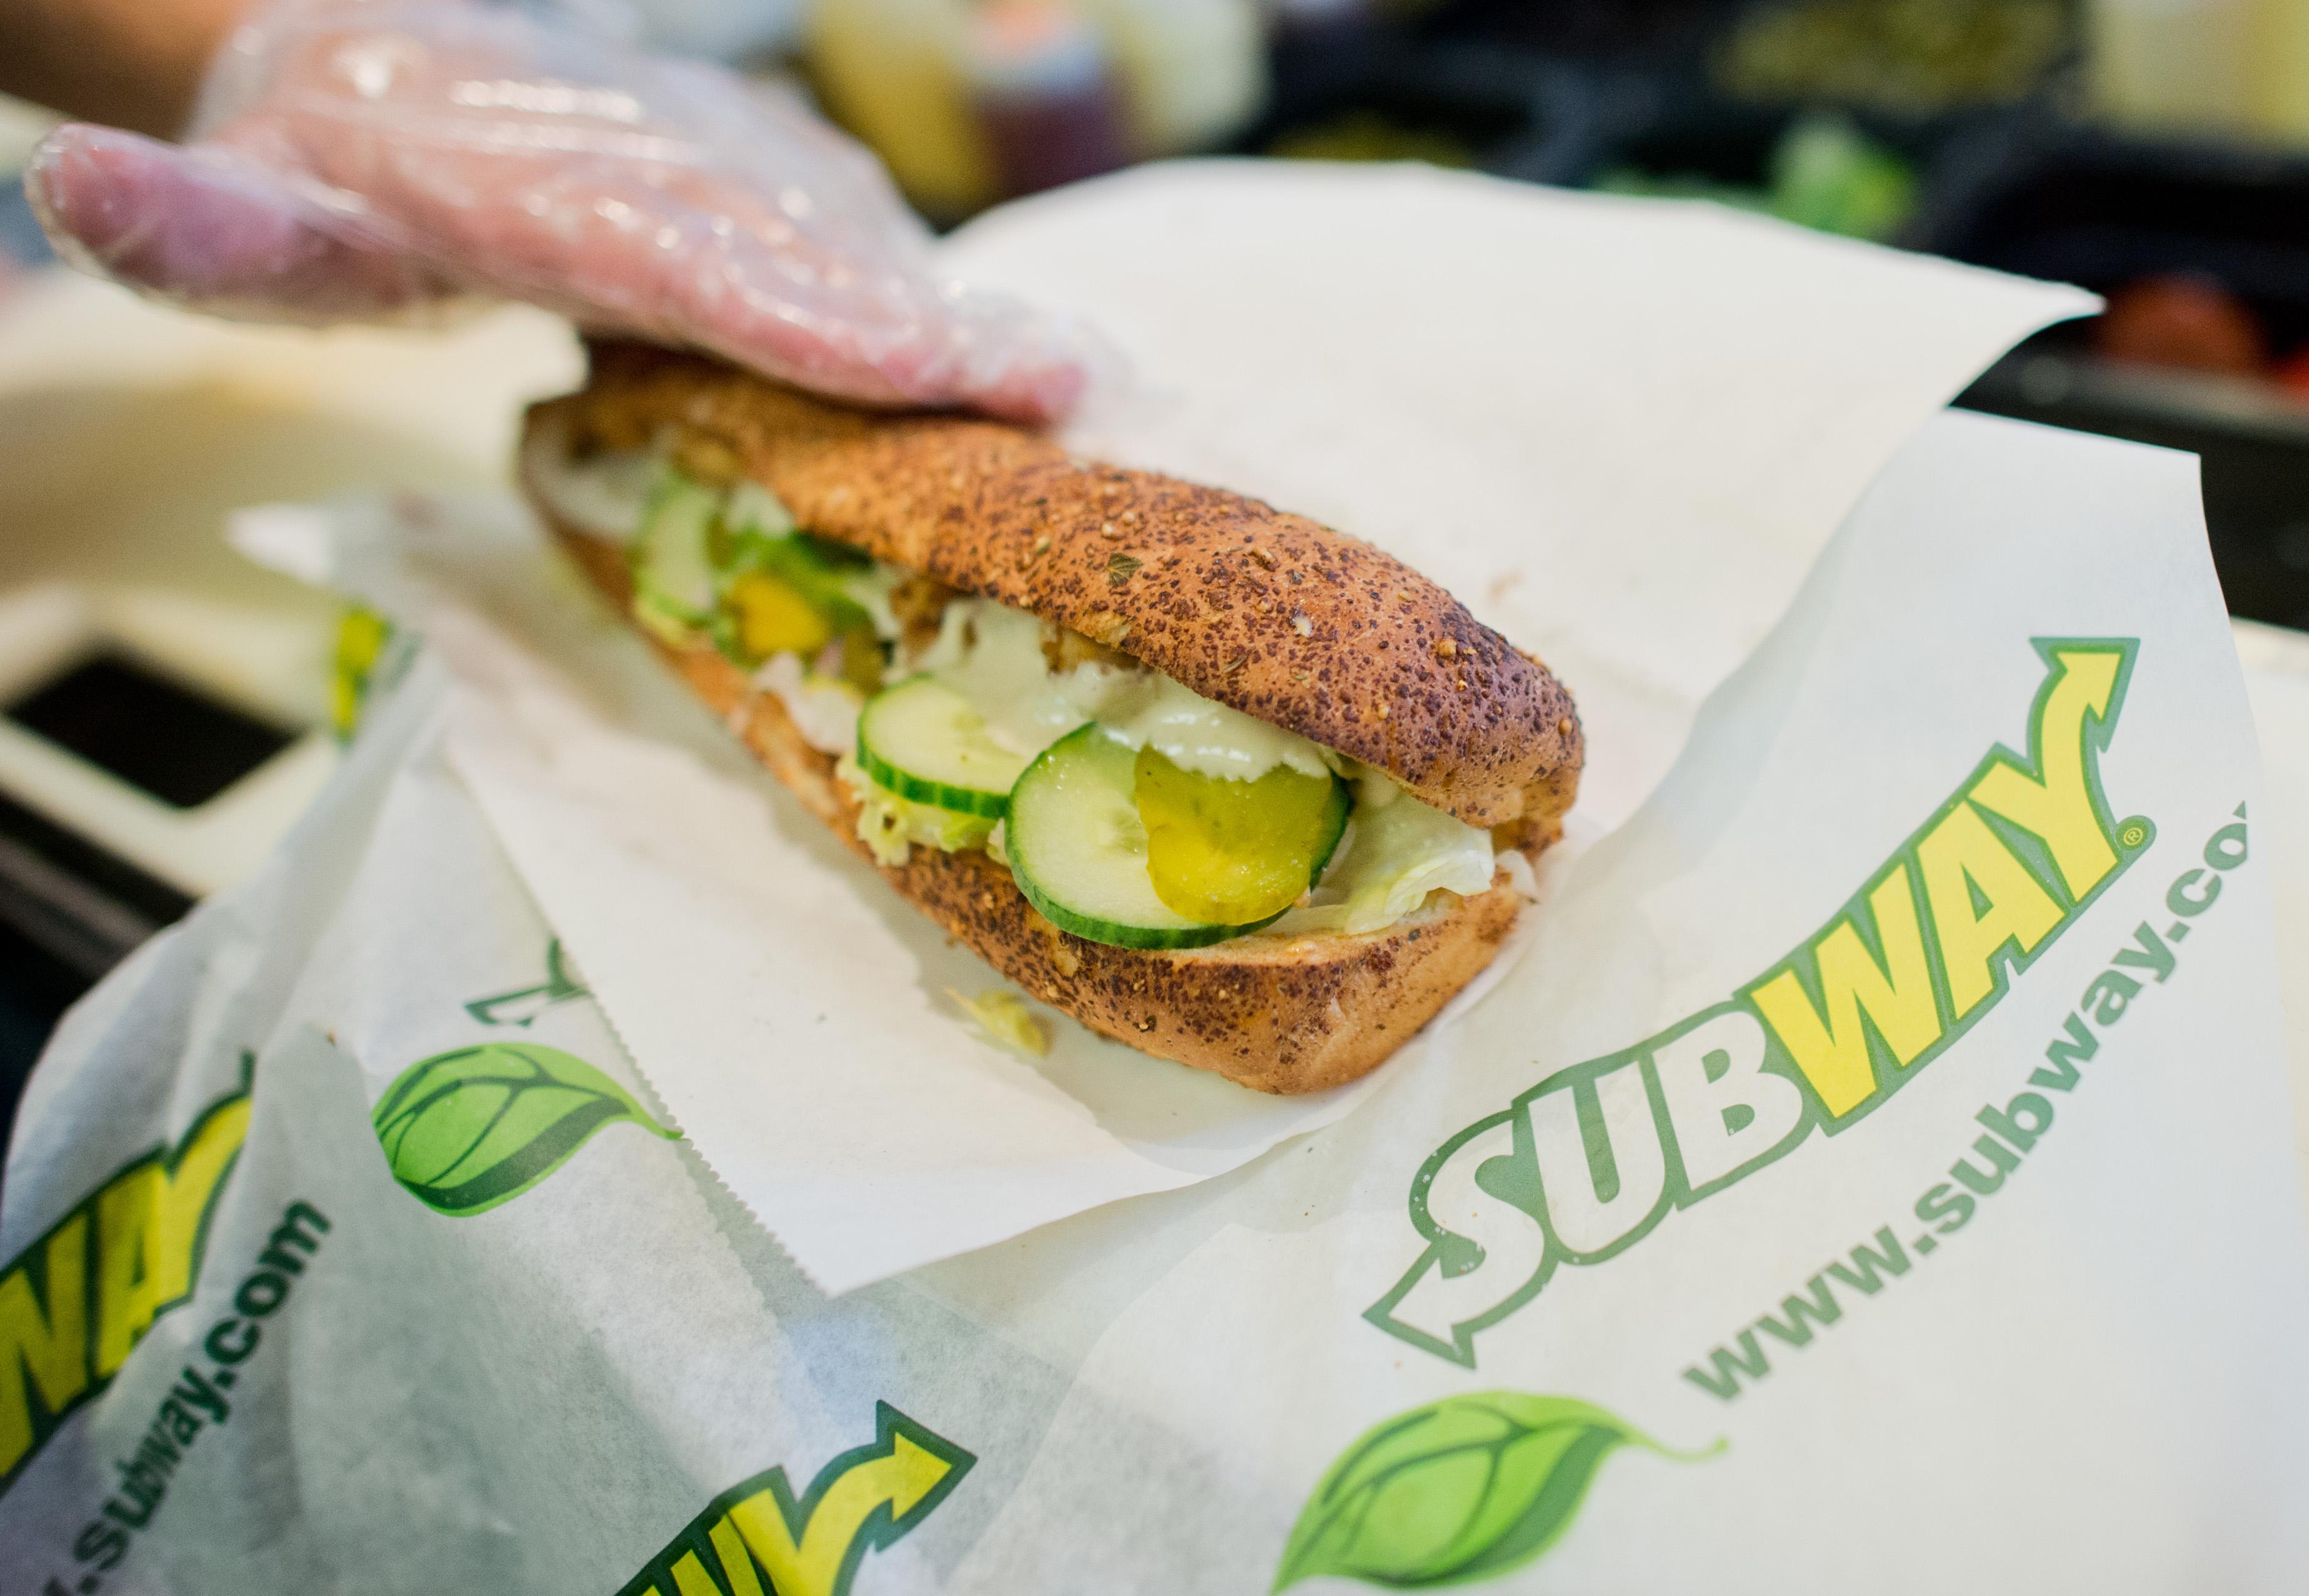 Subway sandwich being made